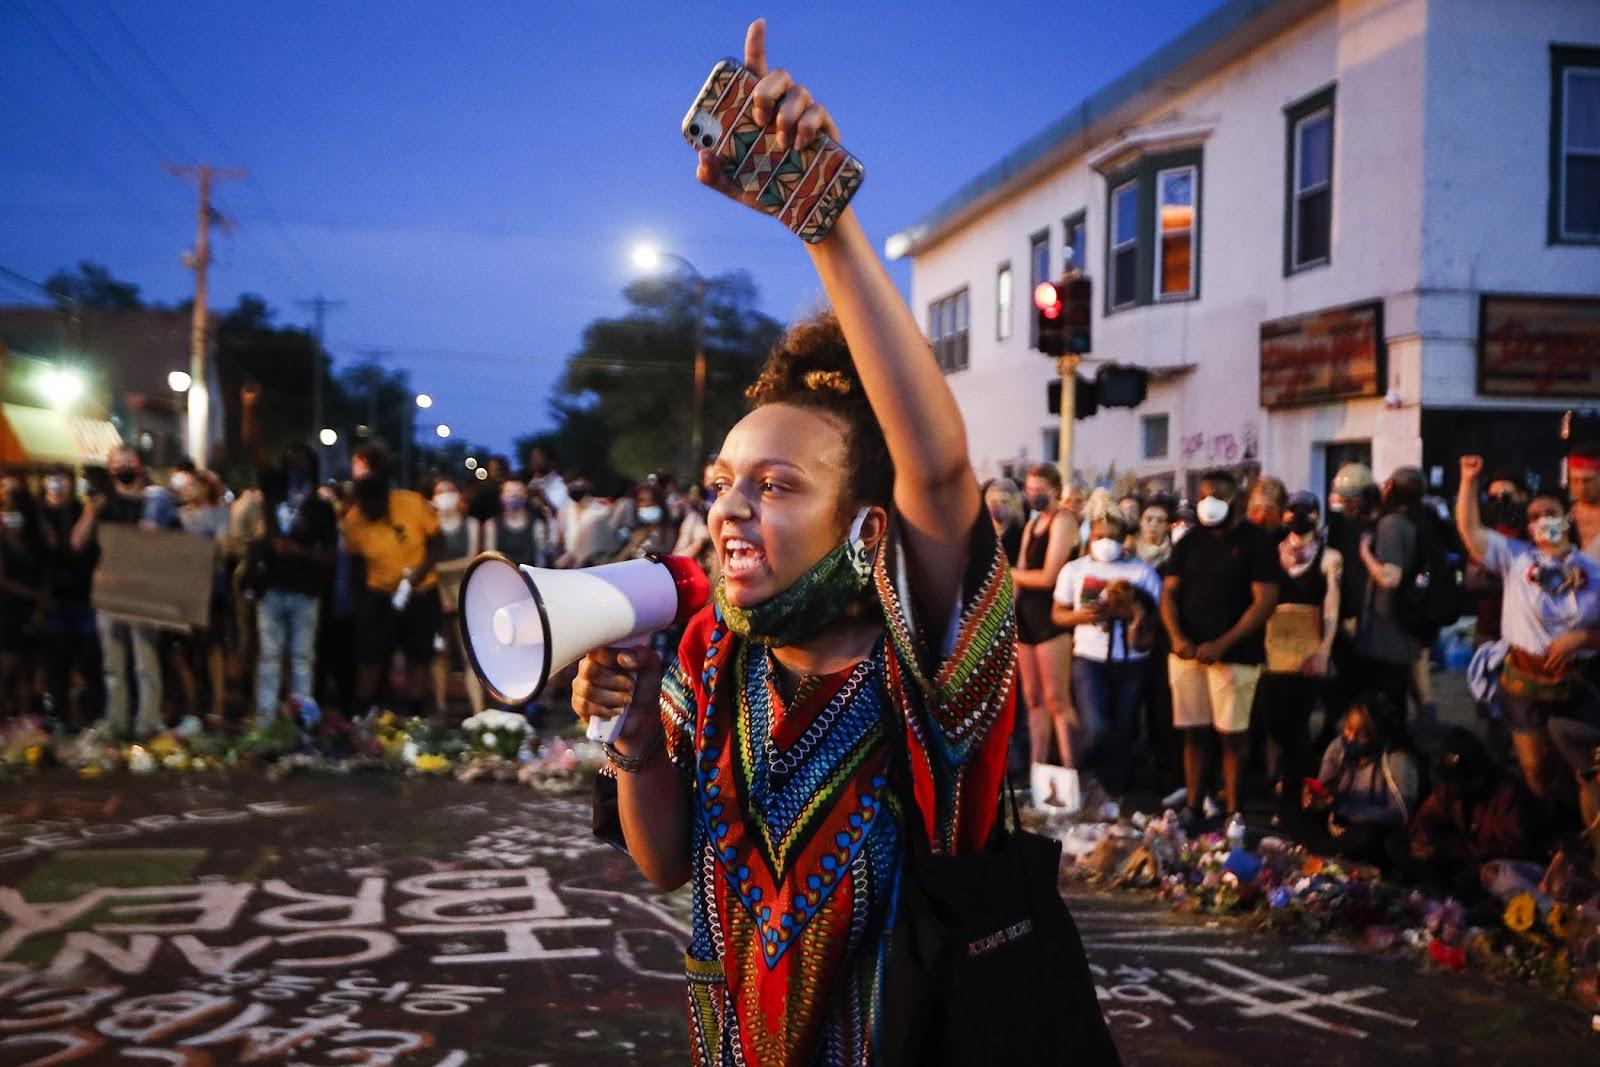 George-Floyd-Protests-Activism-Social-Justice-004.jpg